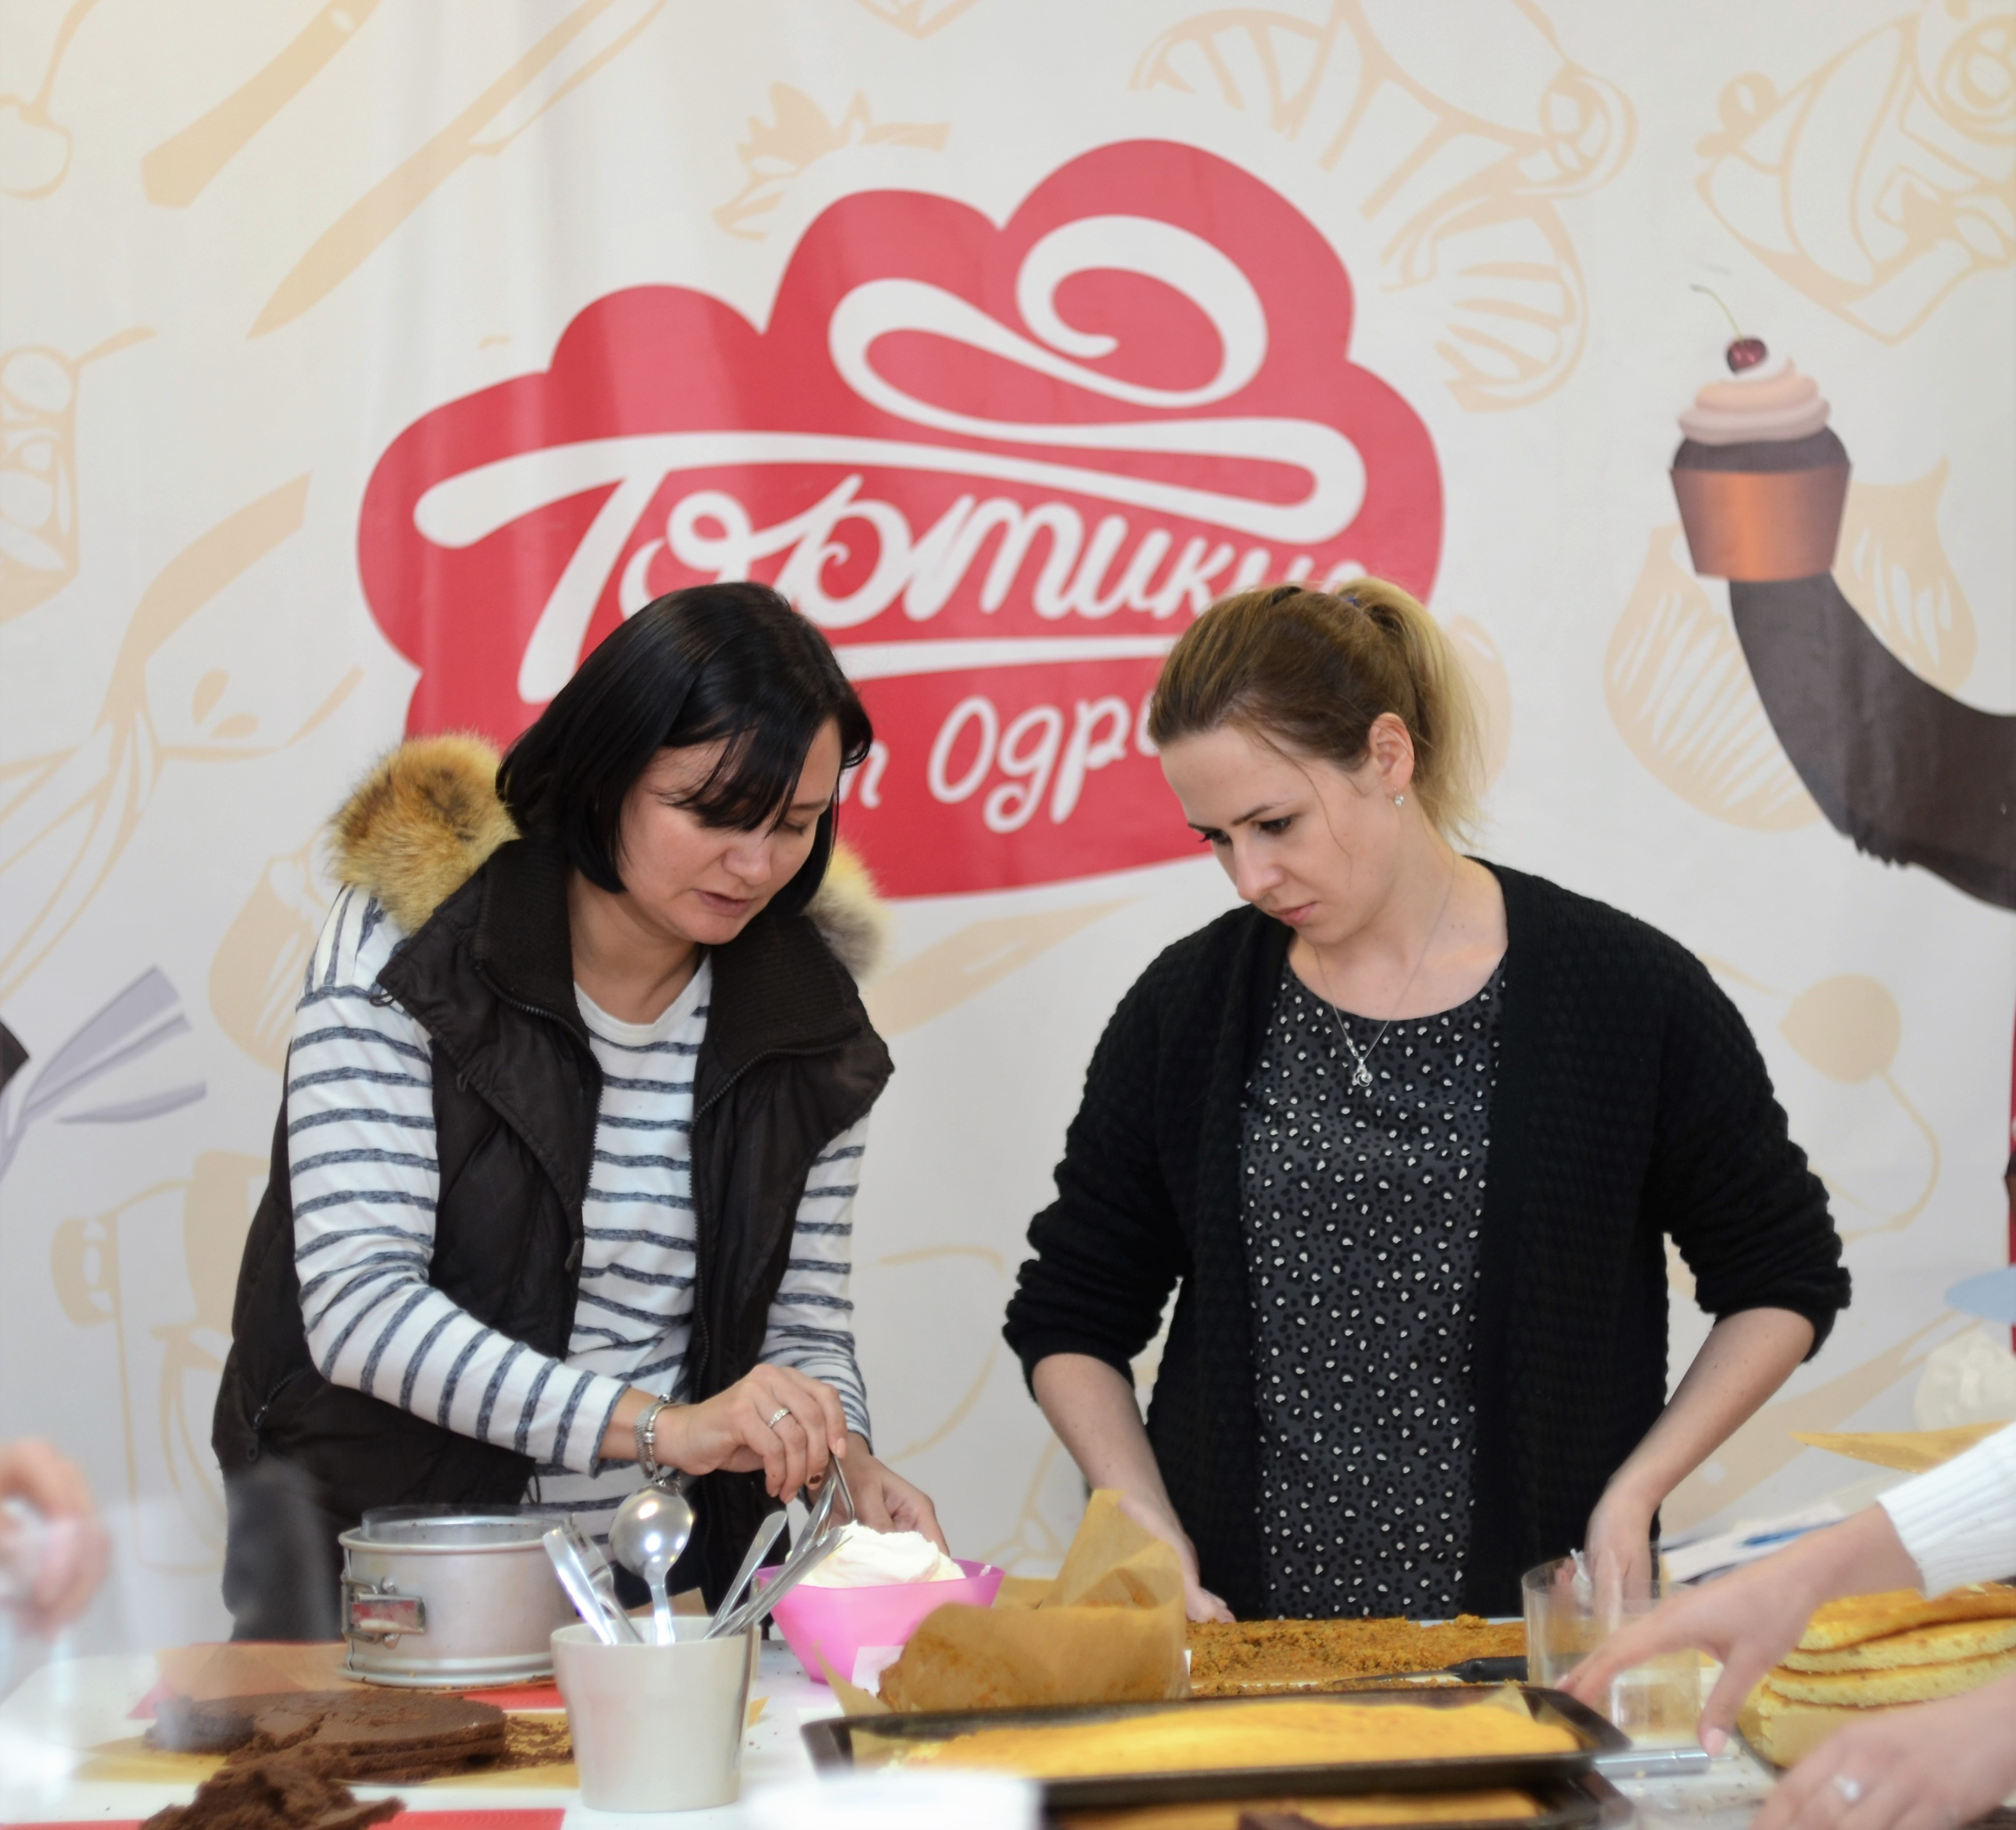 http://odry-school.ru/images/upload/DSC_0374.JPG